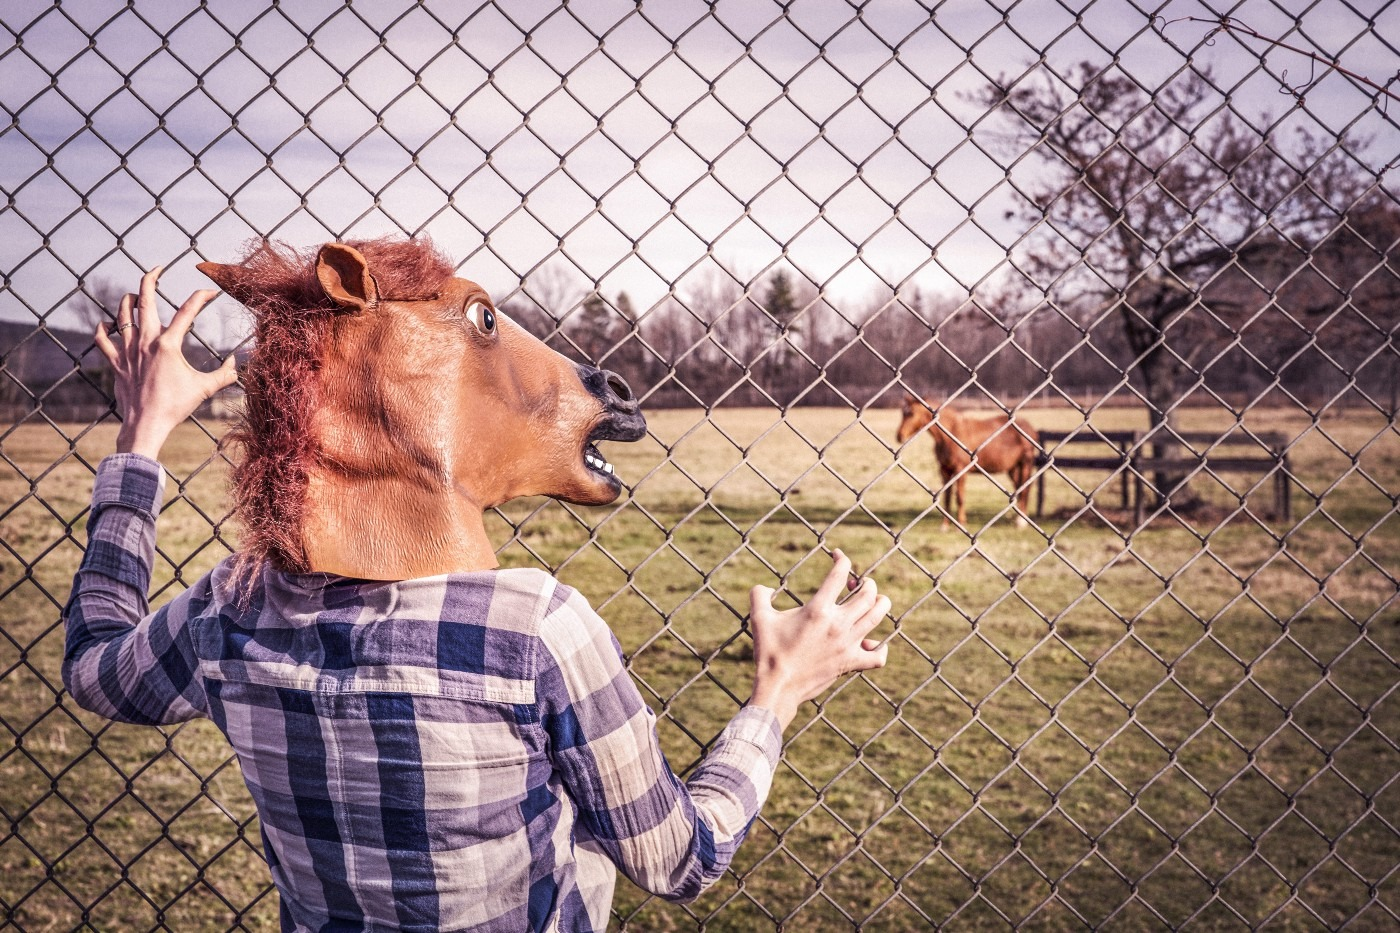 Person Imitating Horse